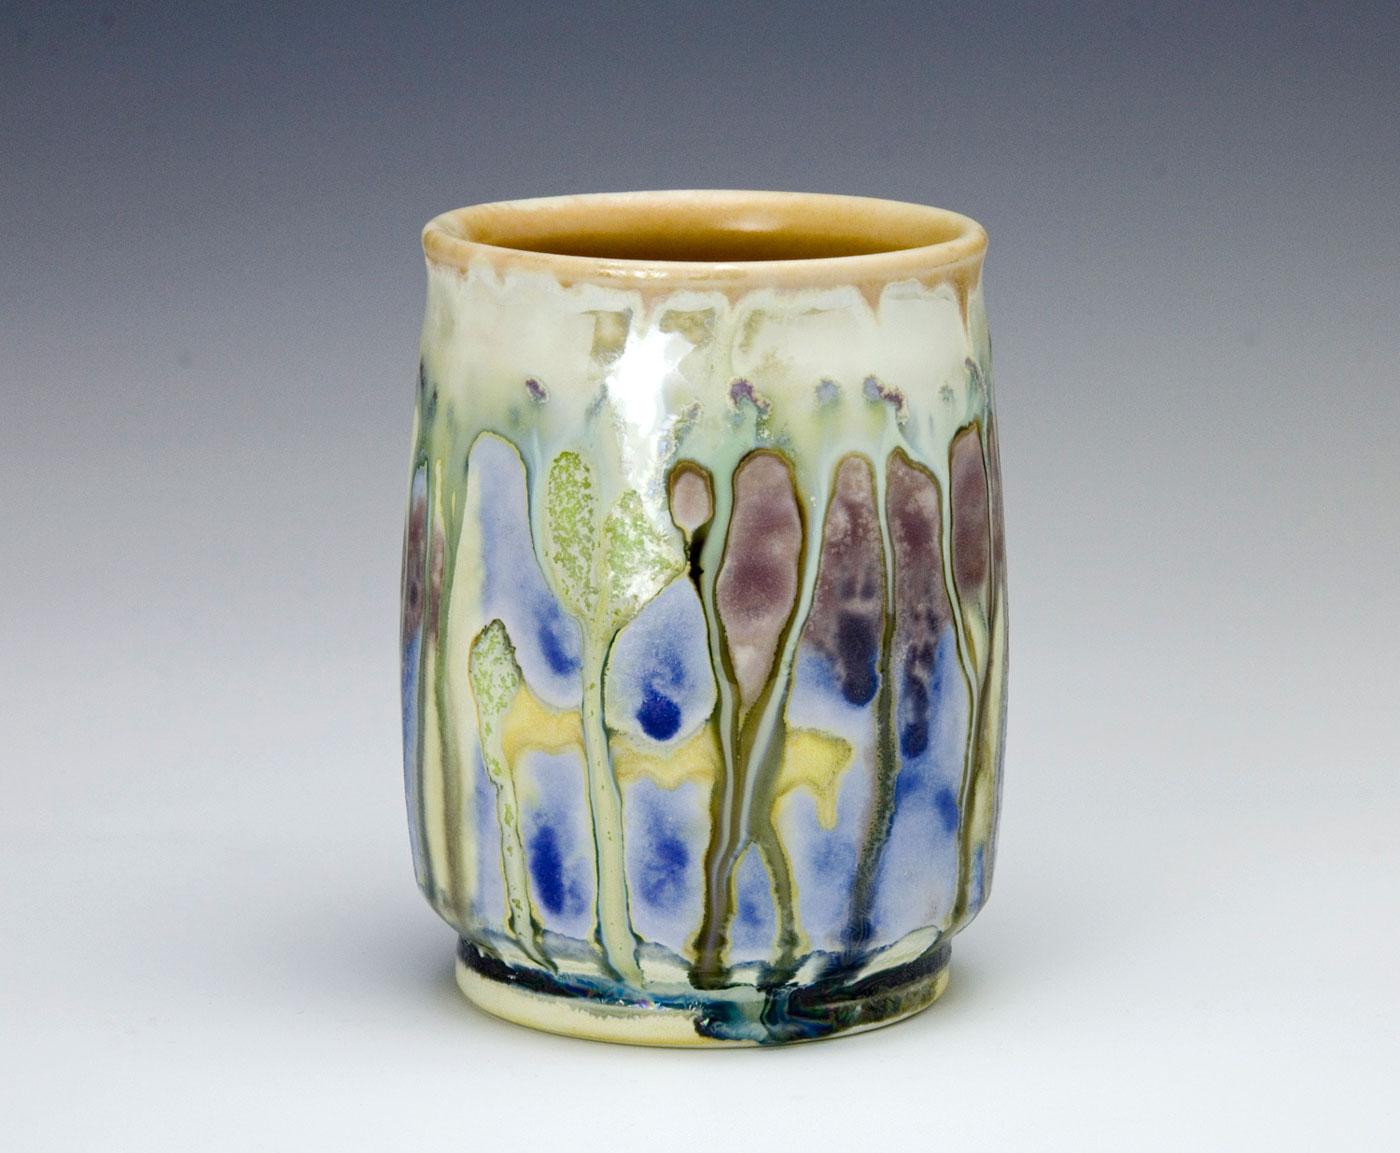 Art-Flow-crystalline-glaze-Samantha-Henneke-Seagrove-Pottery.jpg